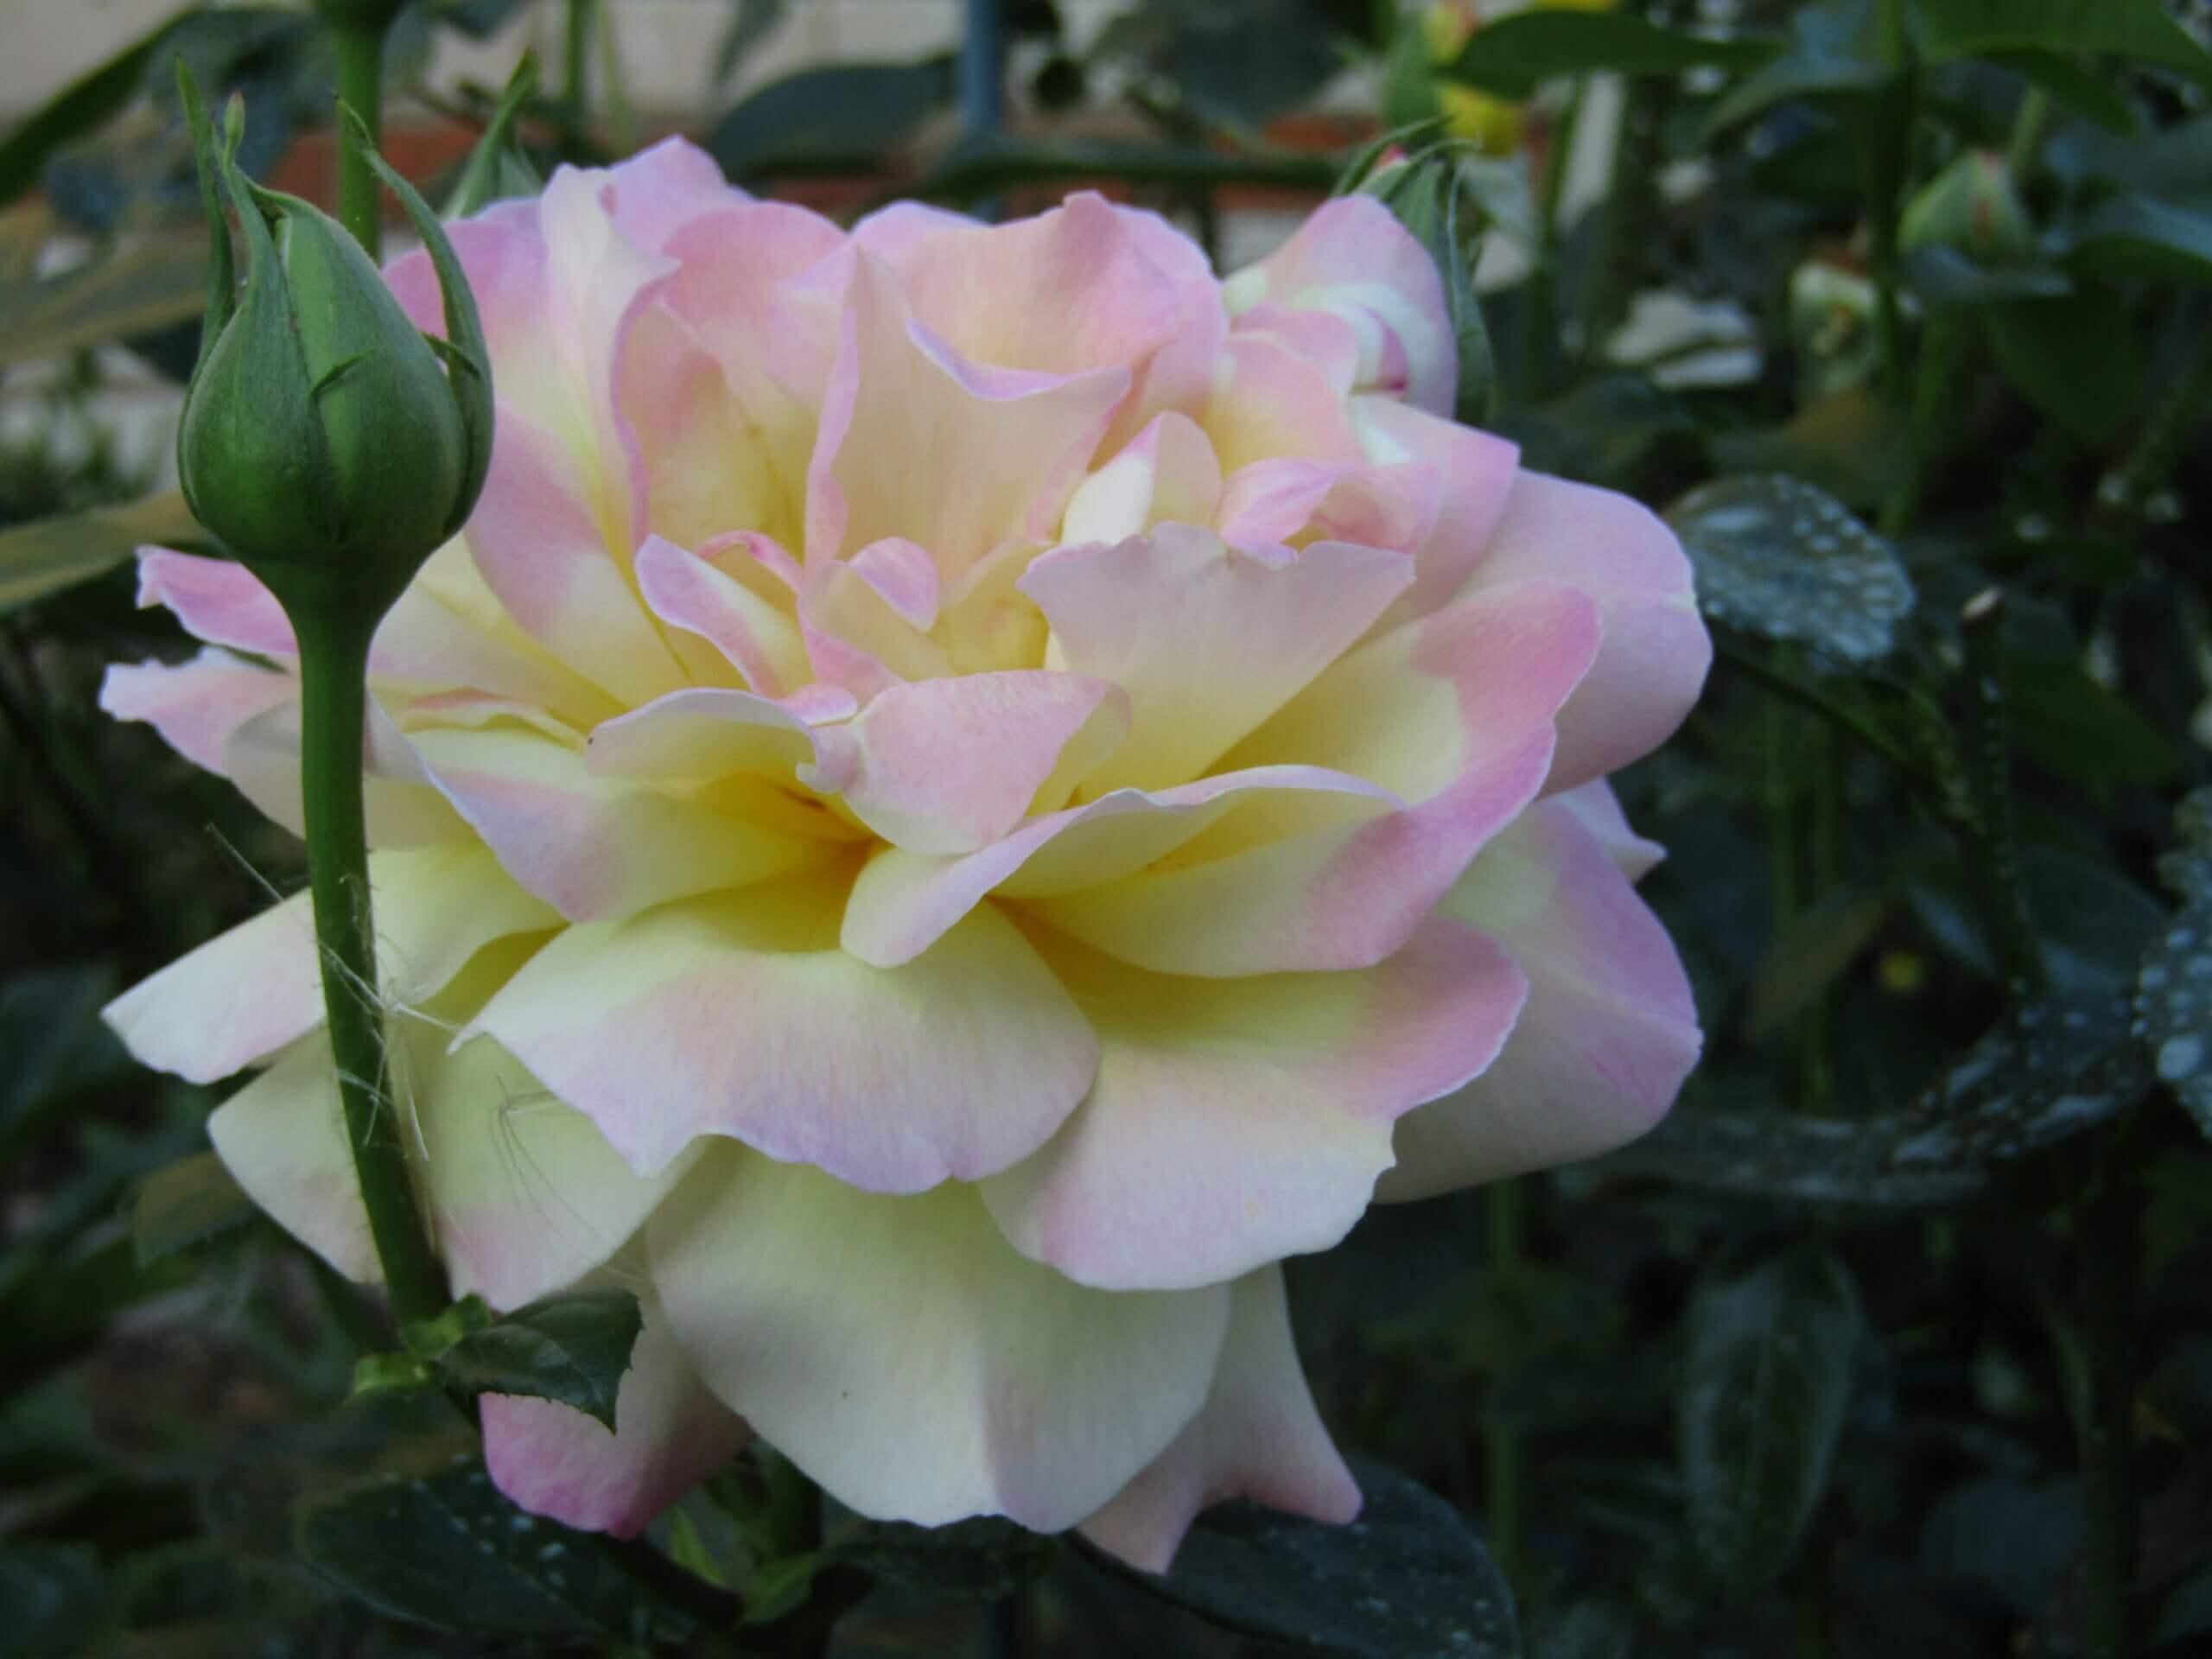 Gloria Dei - знаменитая ярко-желтая чайно-гибридная роза от французской компании Meilland